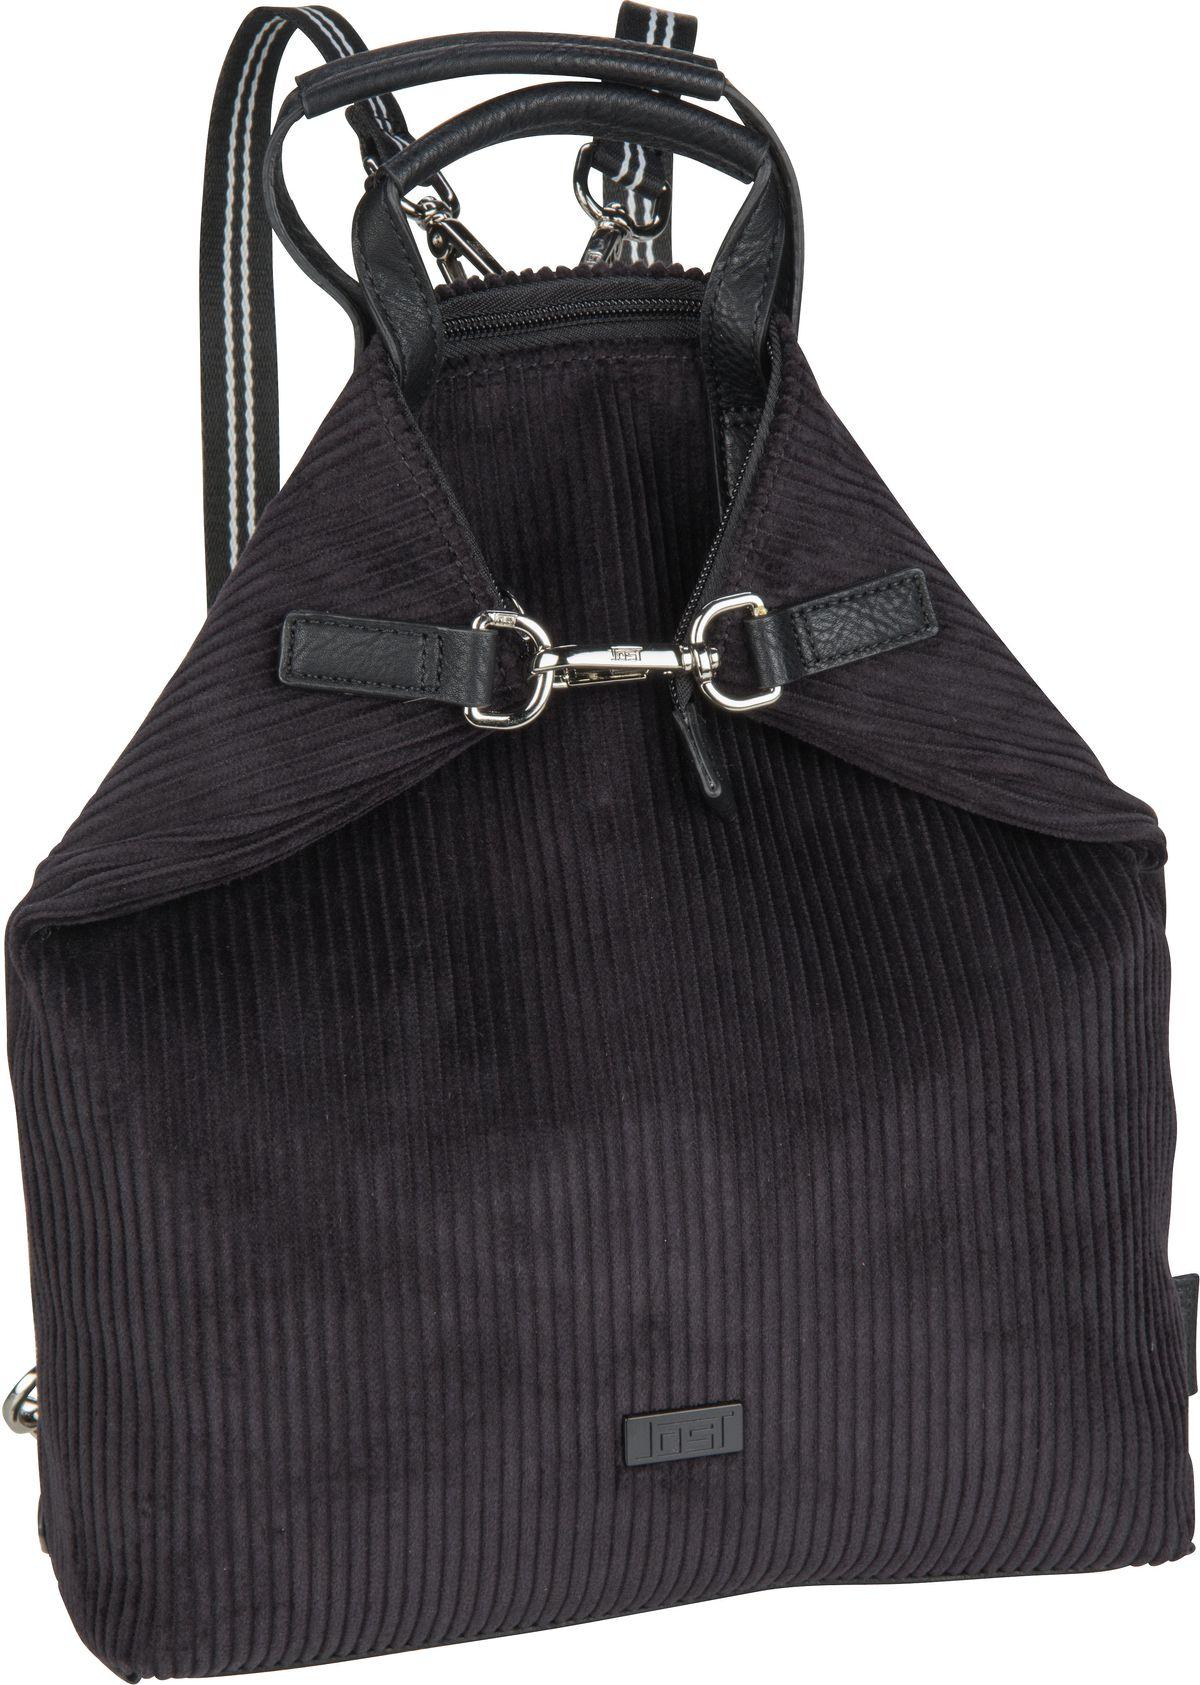 Rucksack / Daypack Cord 7944 X-Change Bag XS Black